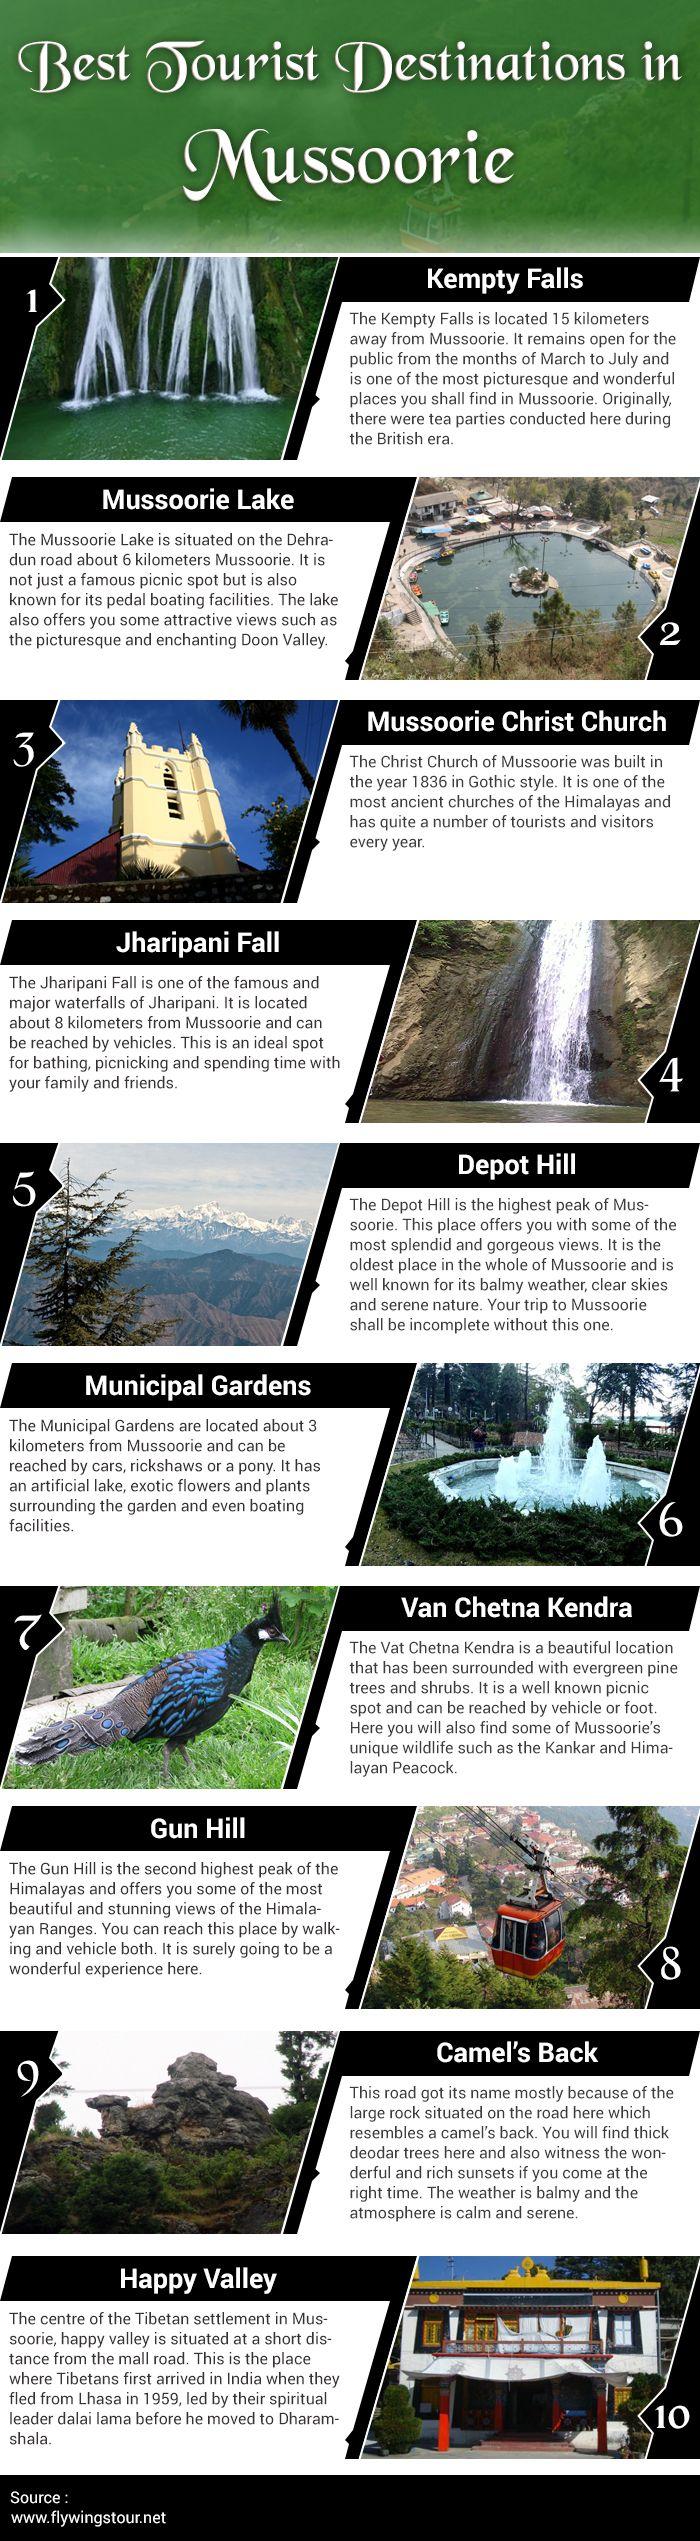 Best Tourist Destinations in #Mussoorie. #Tour #Travel #Tourism #India